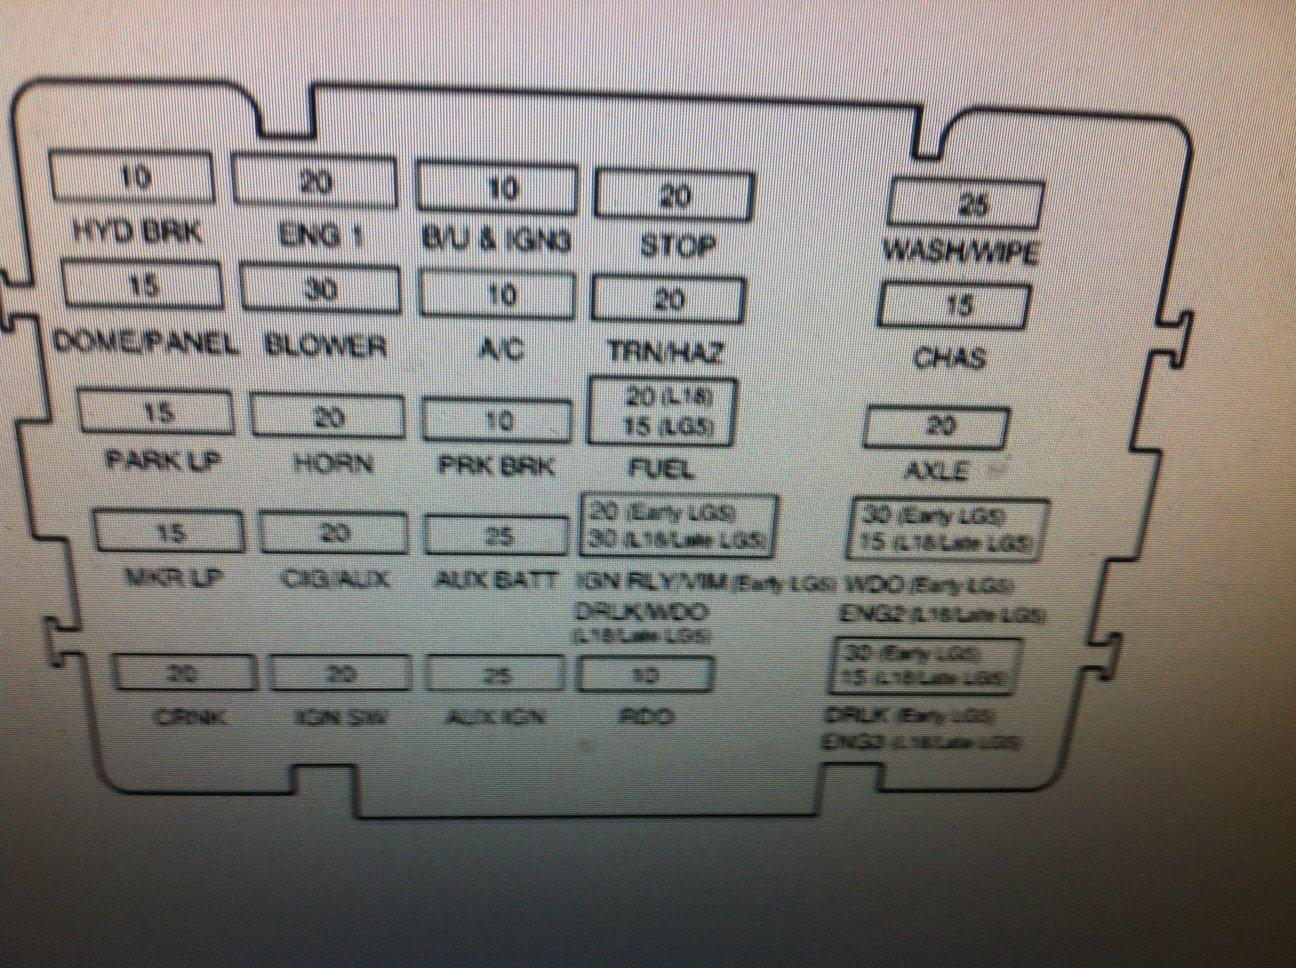 2011 Freightliner Cascadia Instrument Cluster Wiring Diagram